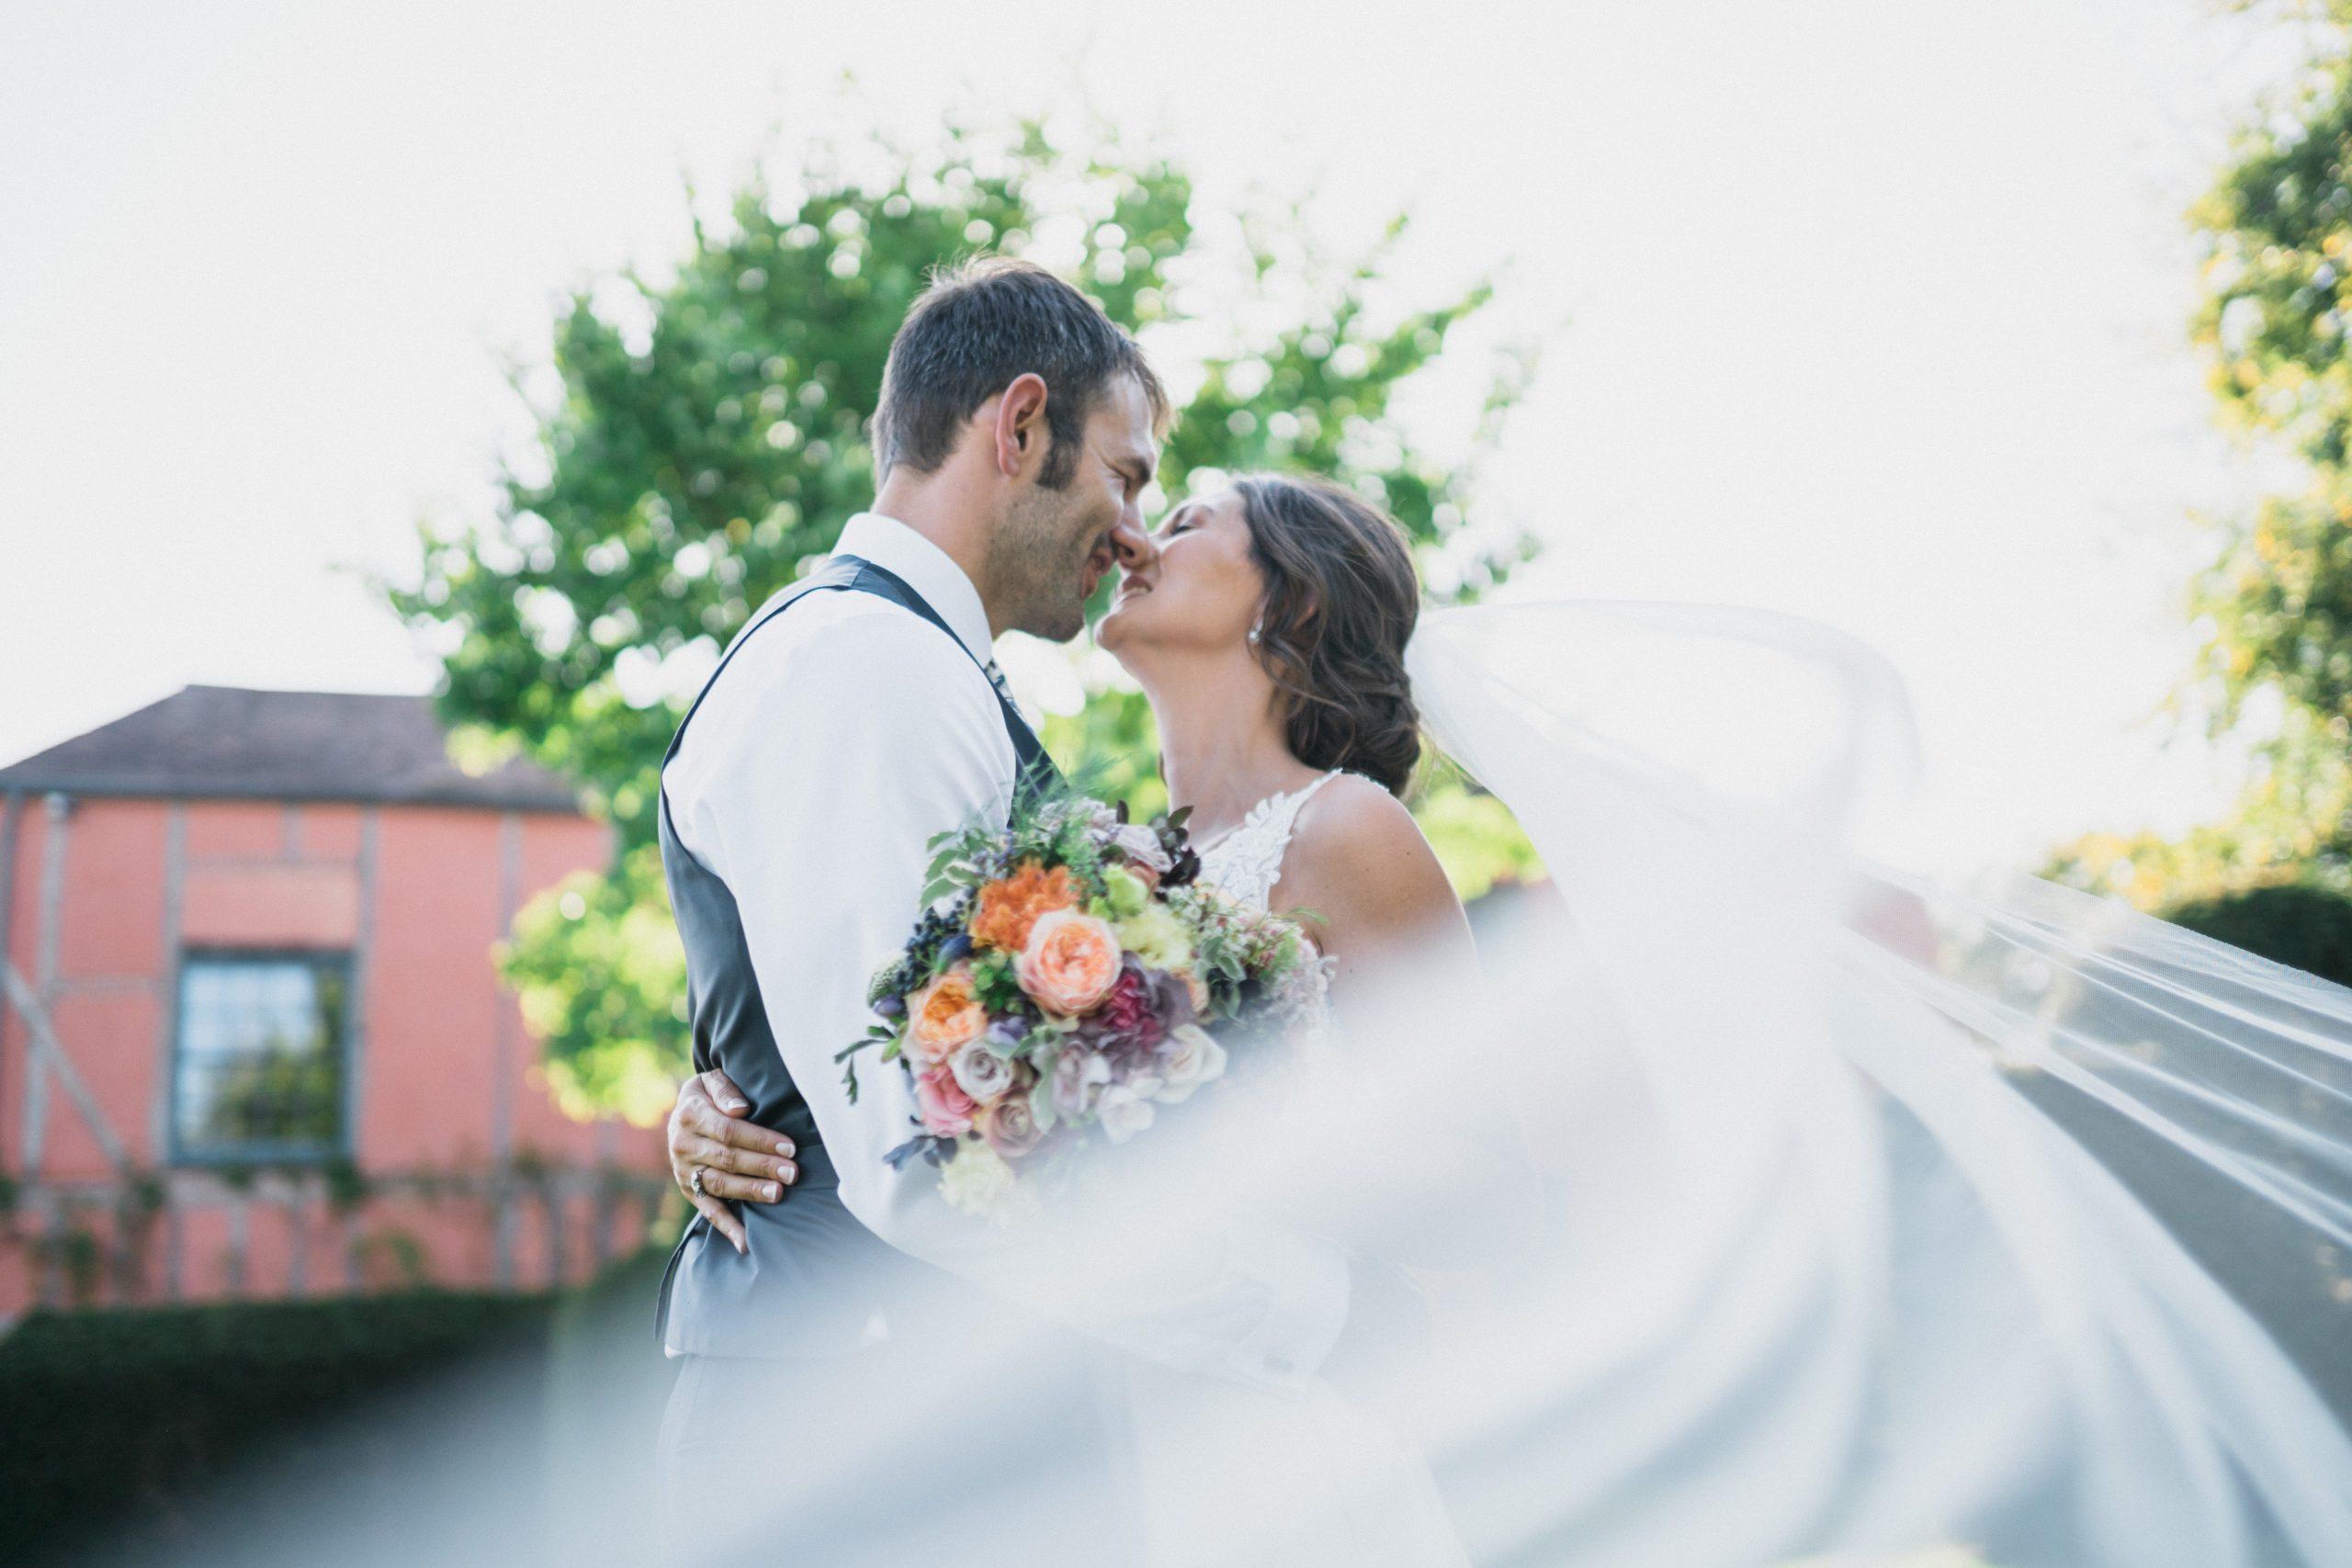 Pauntley court wedding photographer